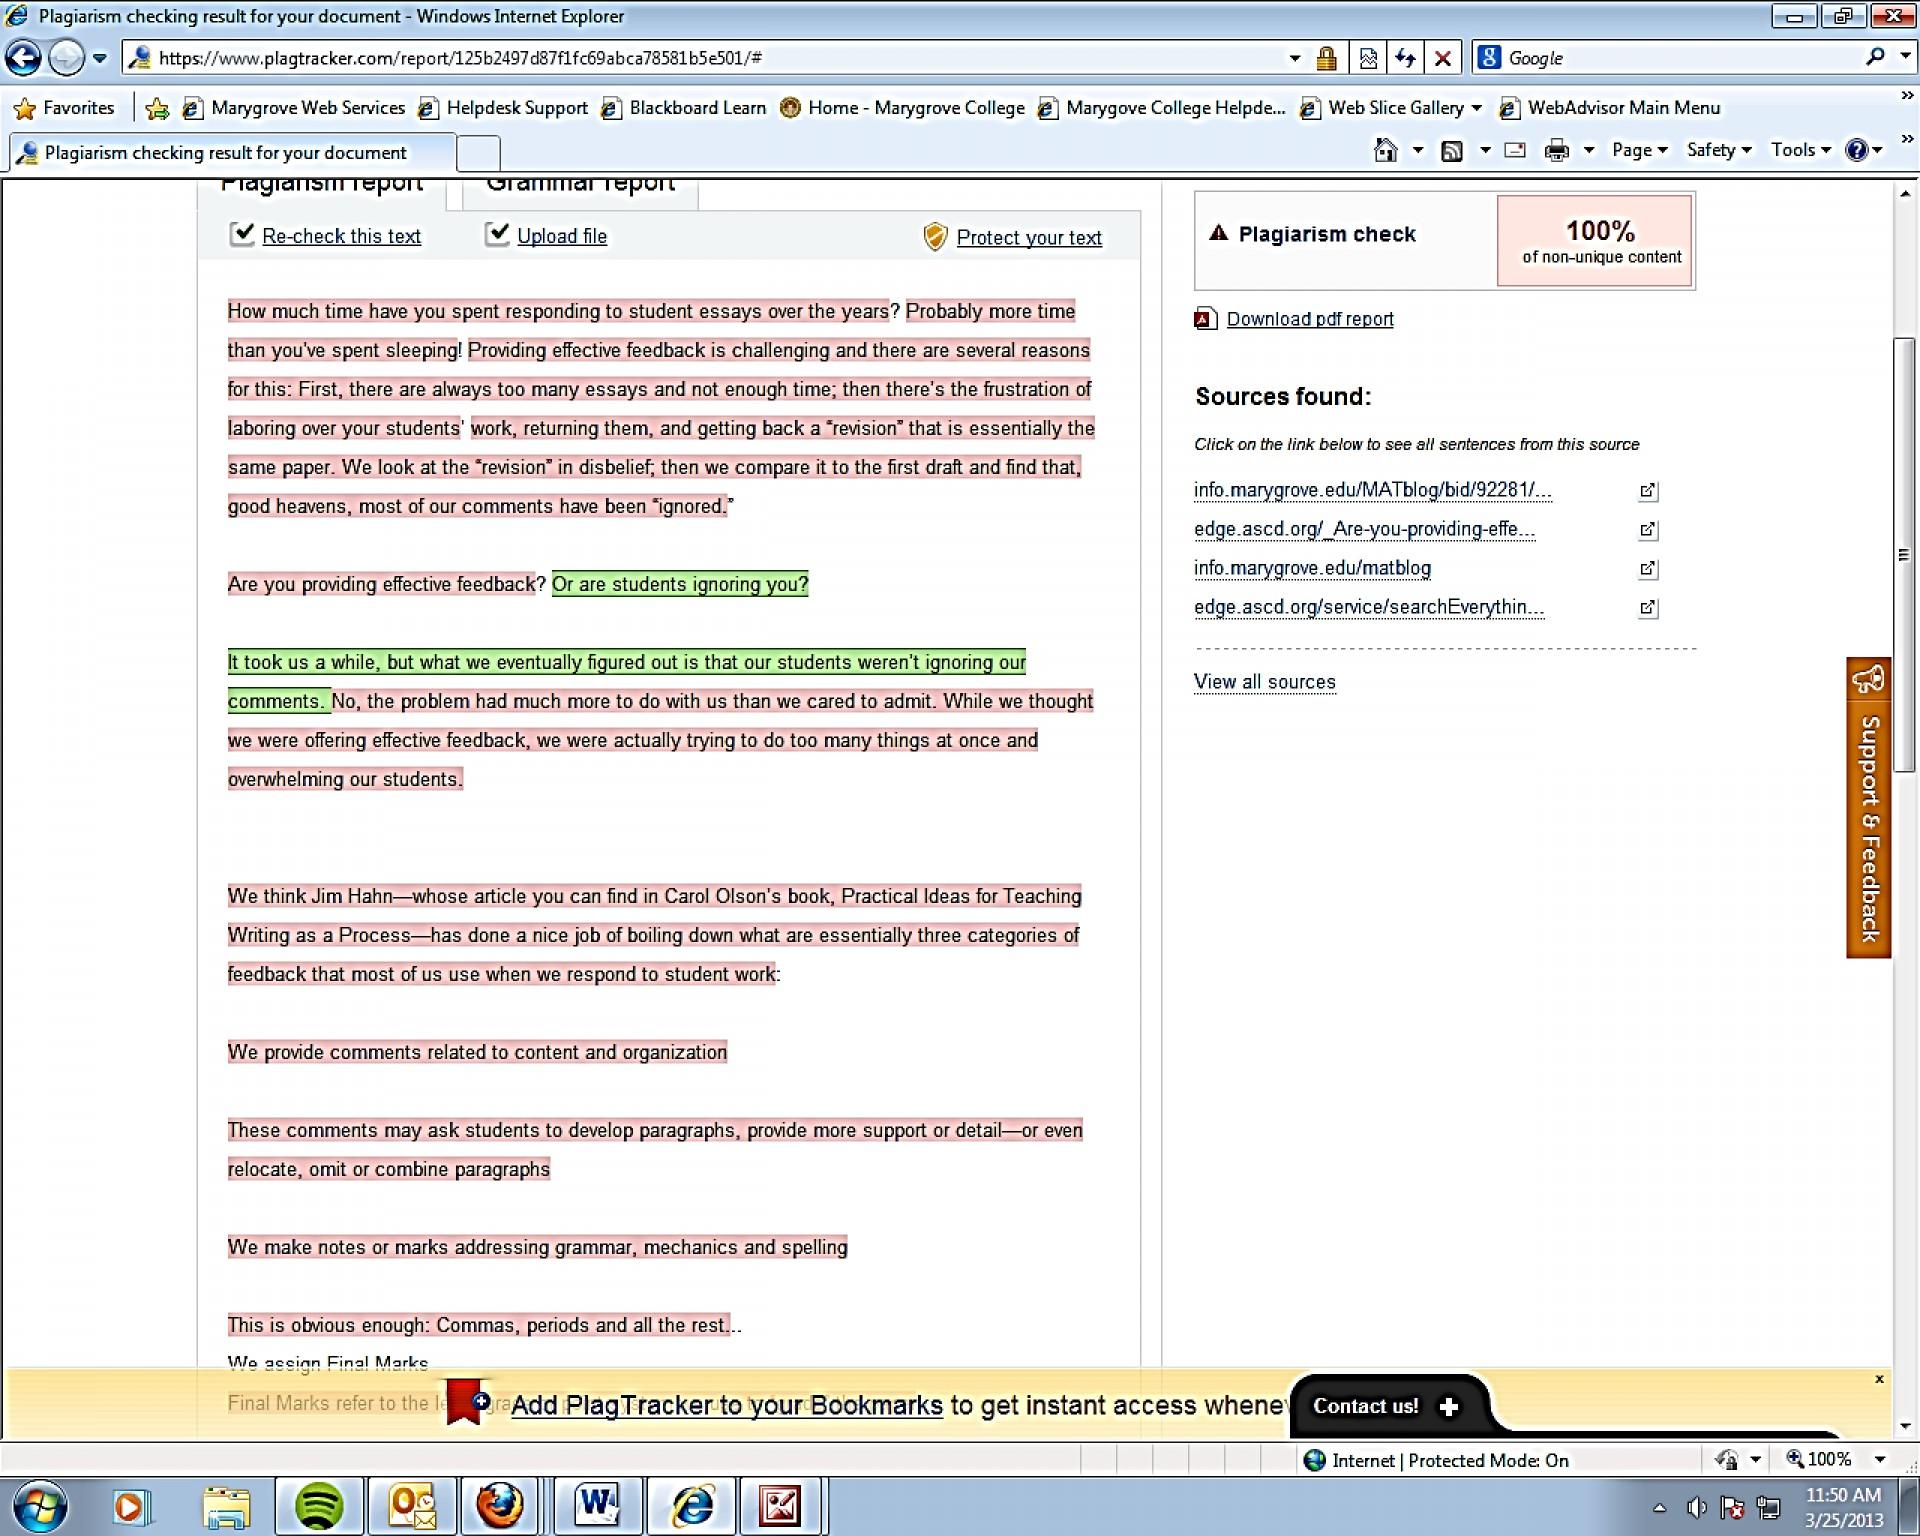 006 Essay Checker Free Online Amazing Sentence Grammar Plagiarism Document 1920